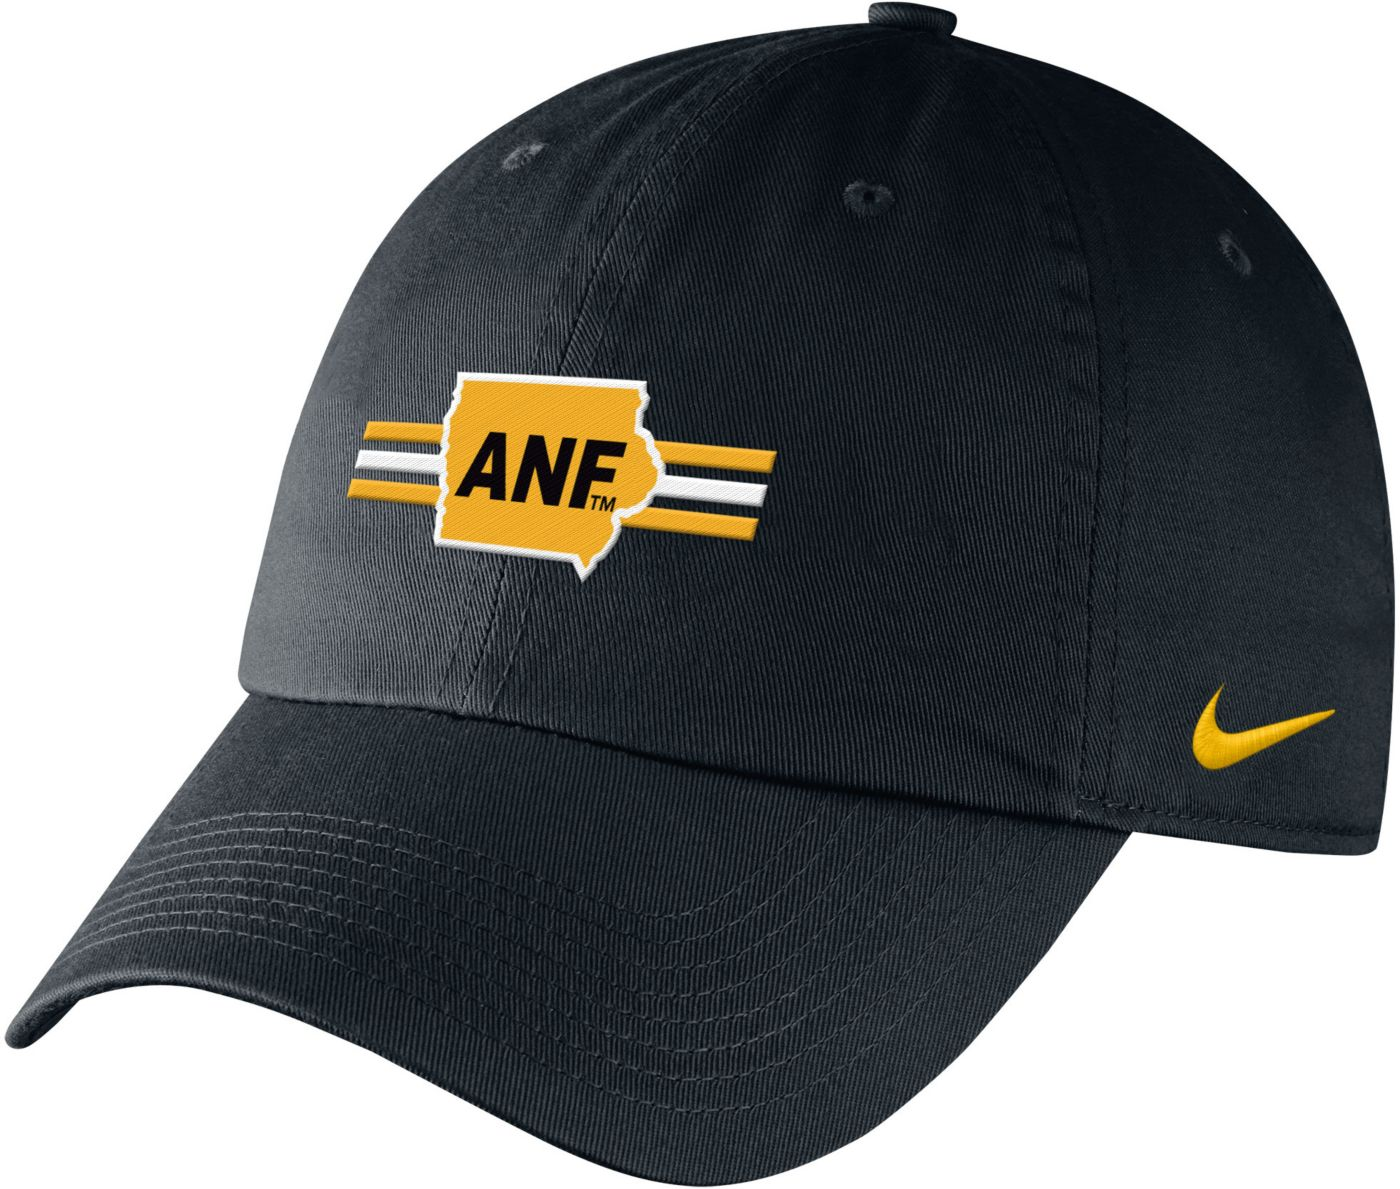 Nike Men's Iowa Hawkeyes ANF Campus Adjustable Black Hat